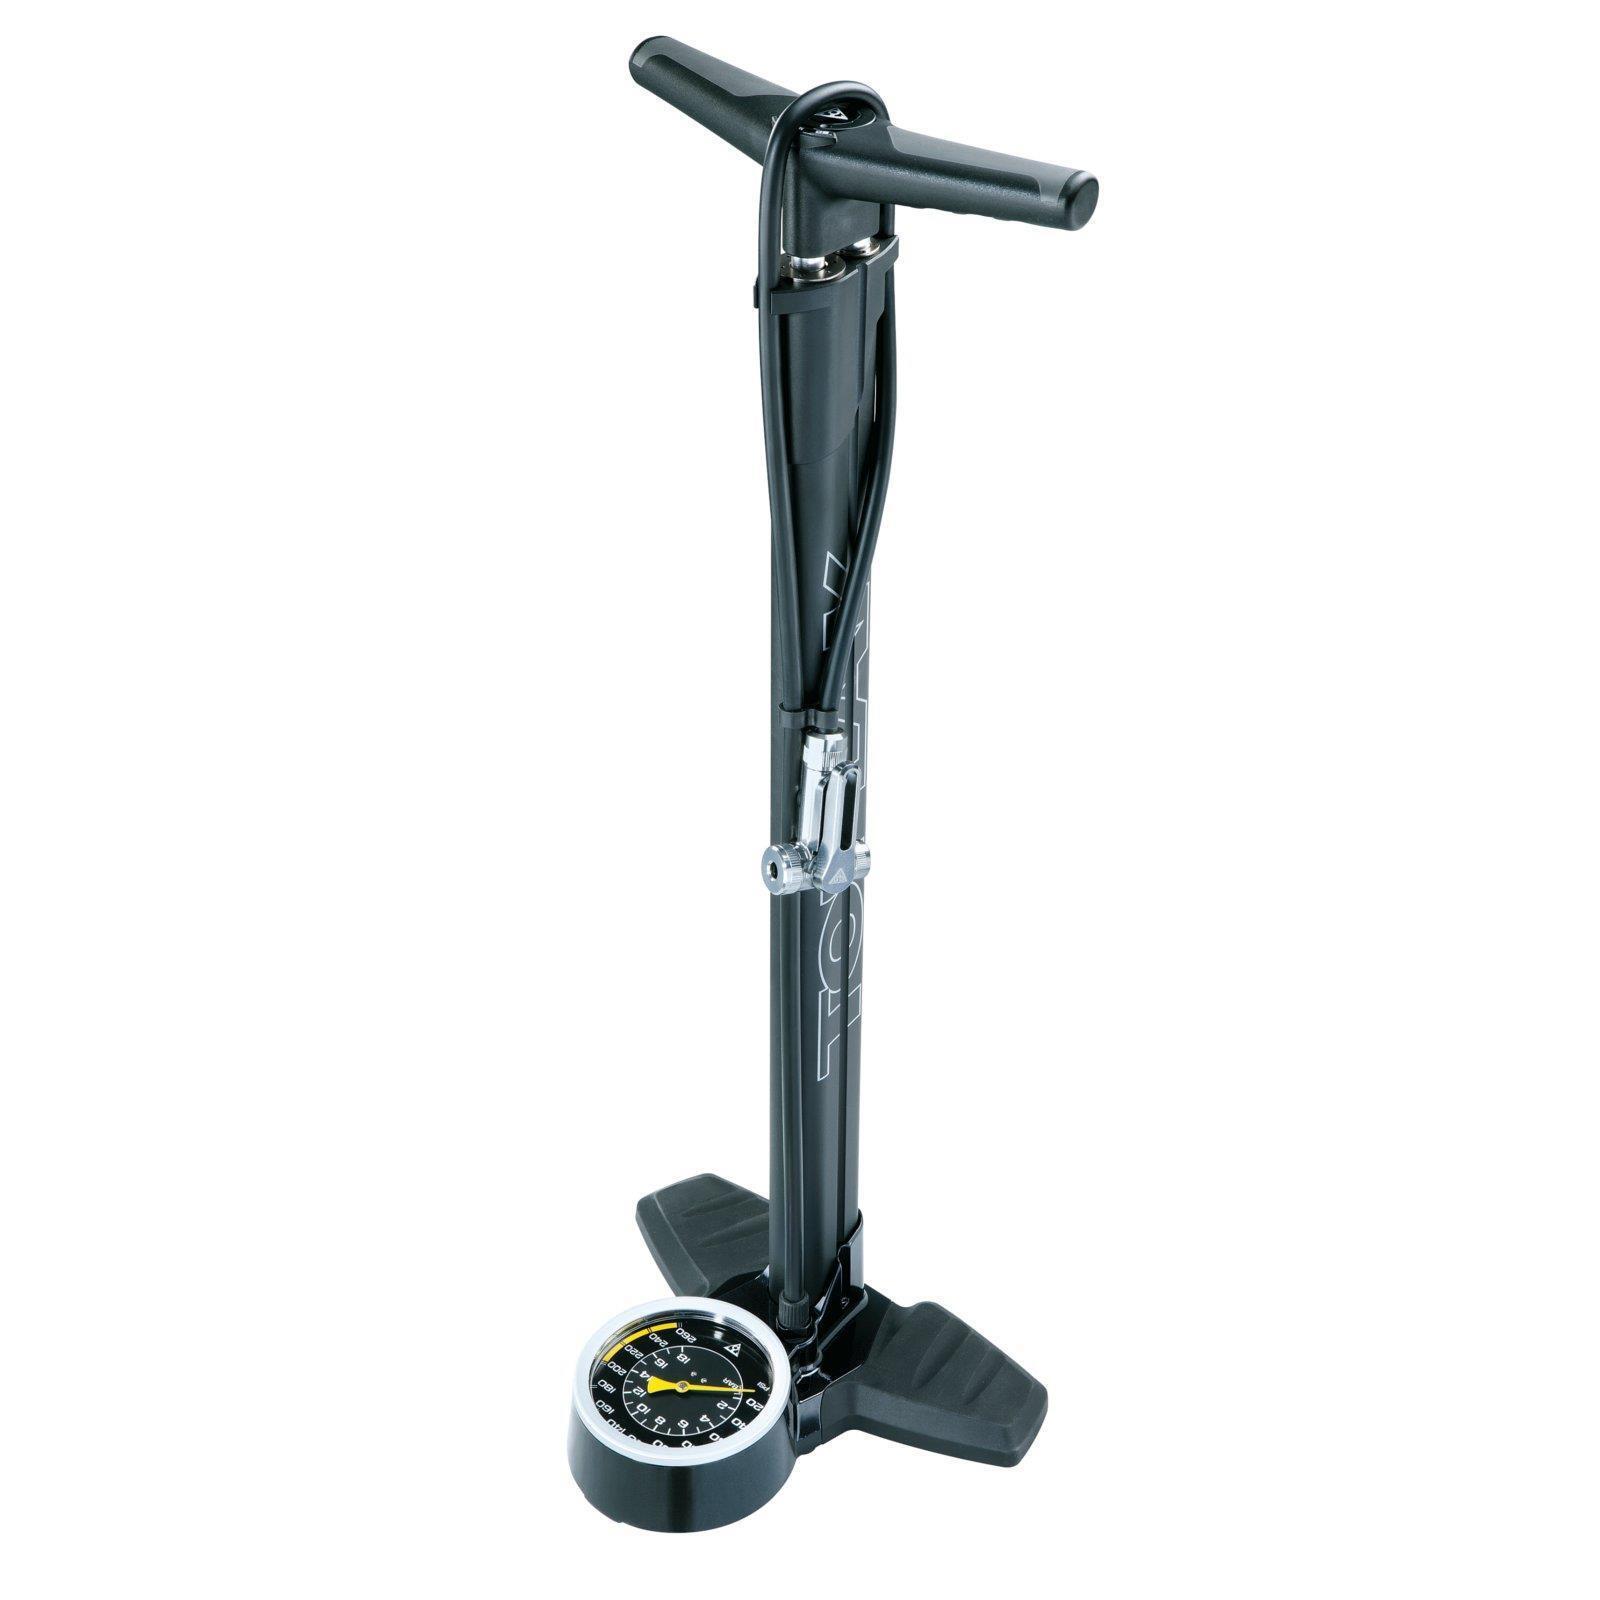 Topeak joeblow Ace DX bicicleta stand bomba bicicleta bomba de aire 18 bar Schrader DV